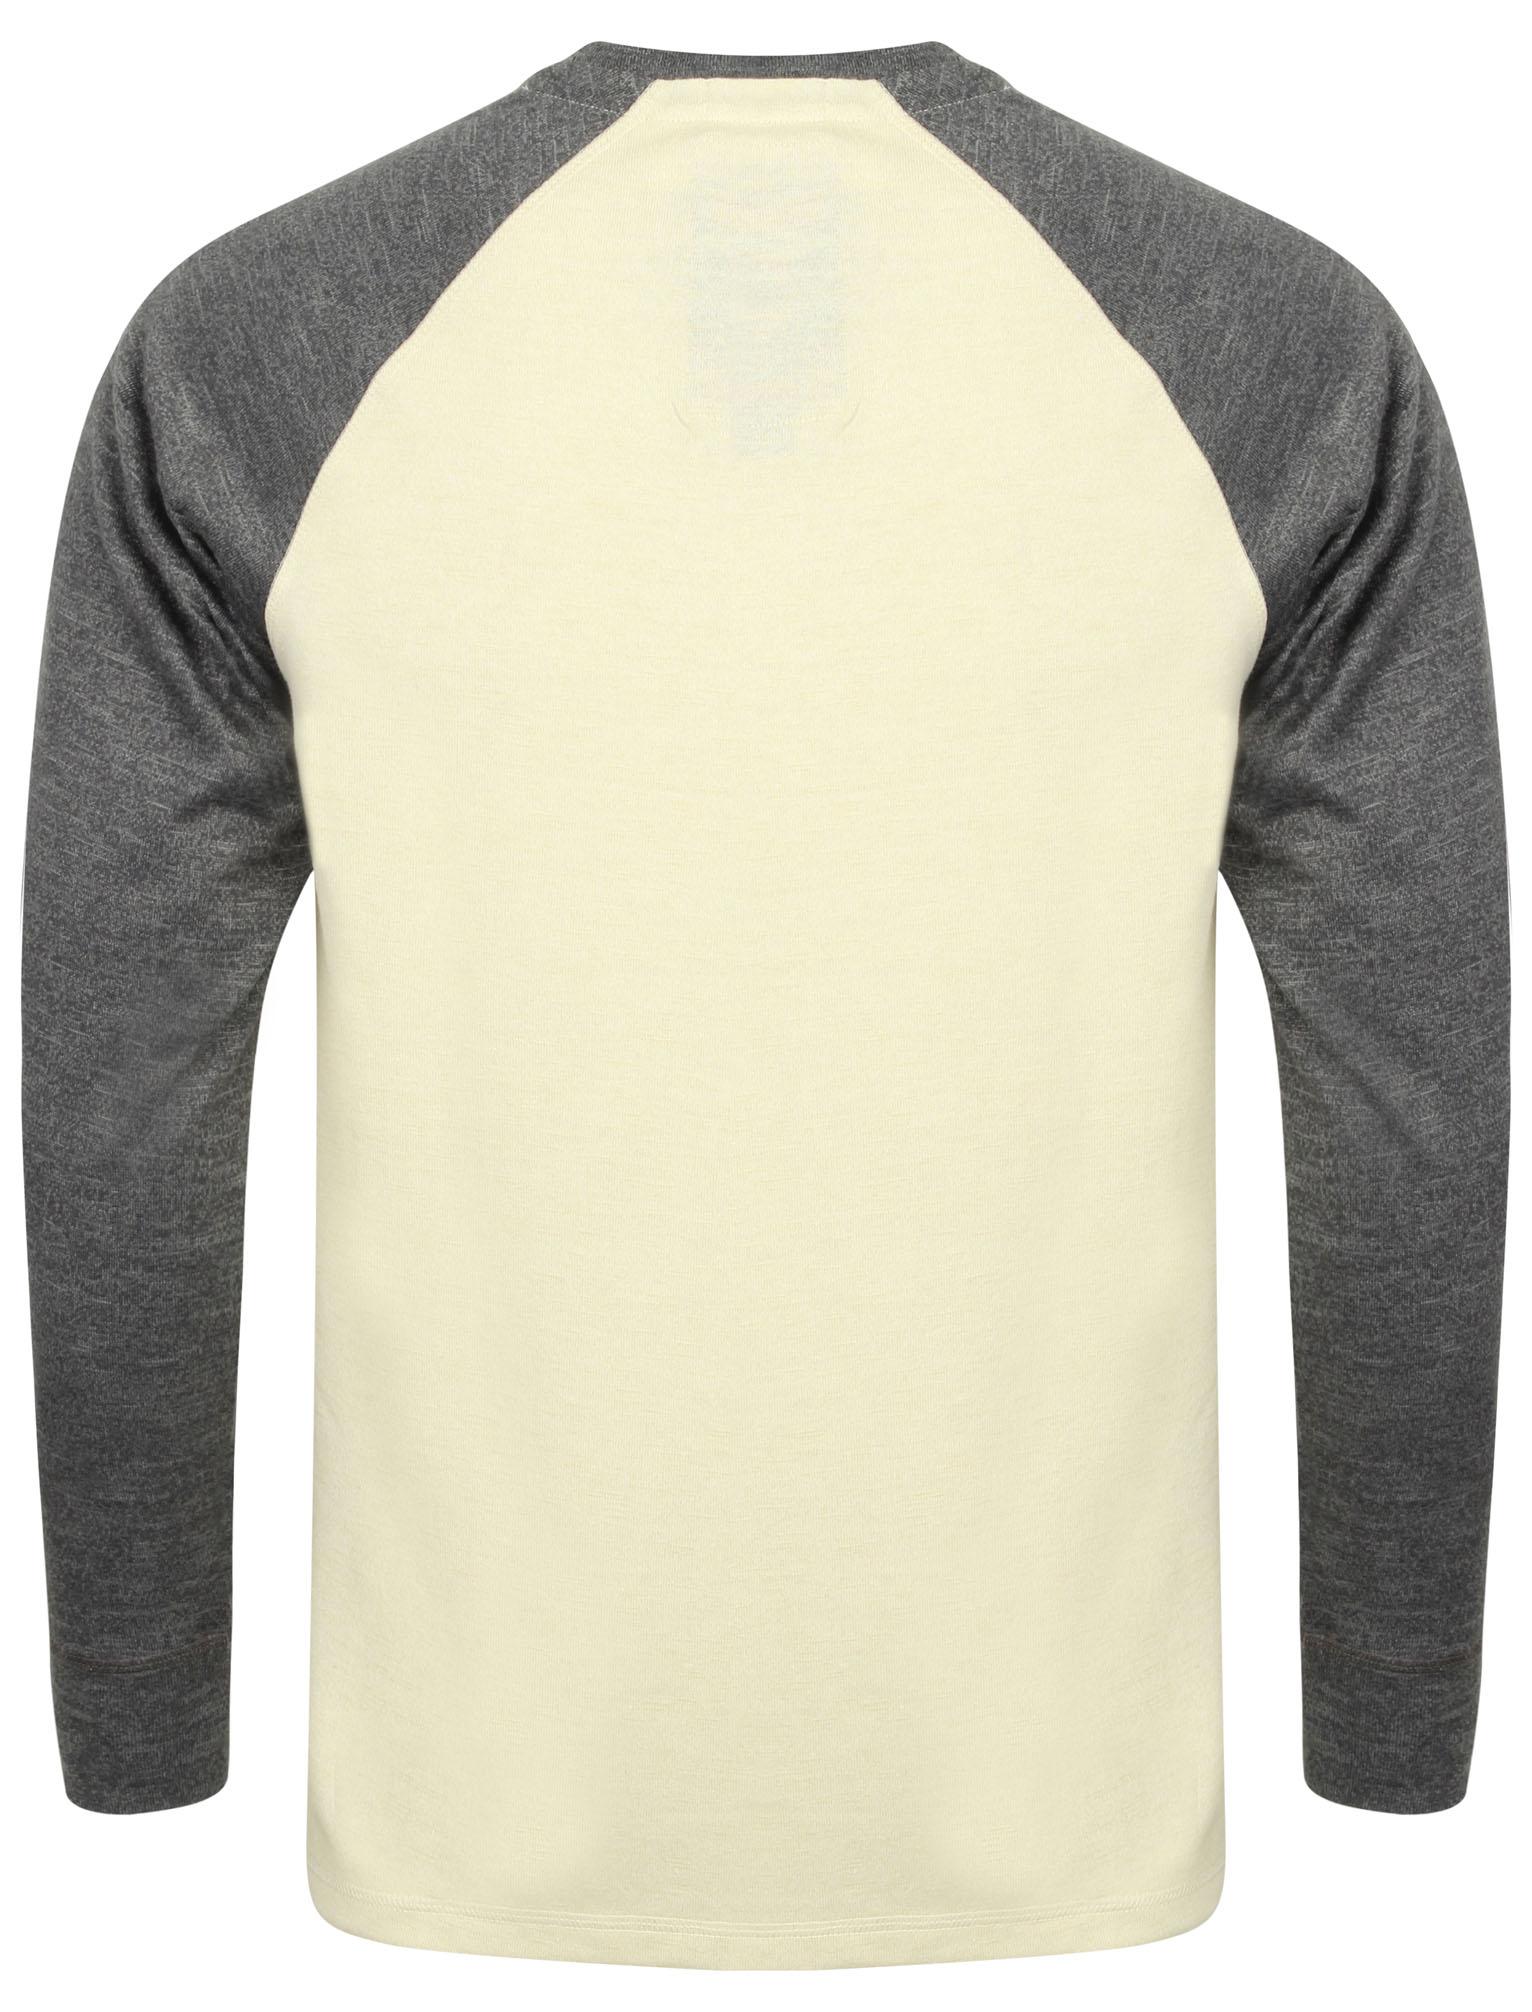 New-Tokyo-Laundry-Mens-Crew-Neck-Cotton-Blend-Long-Contrast-Sleeve-Top-Size-S-XL thumbnail 13